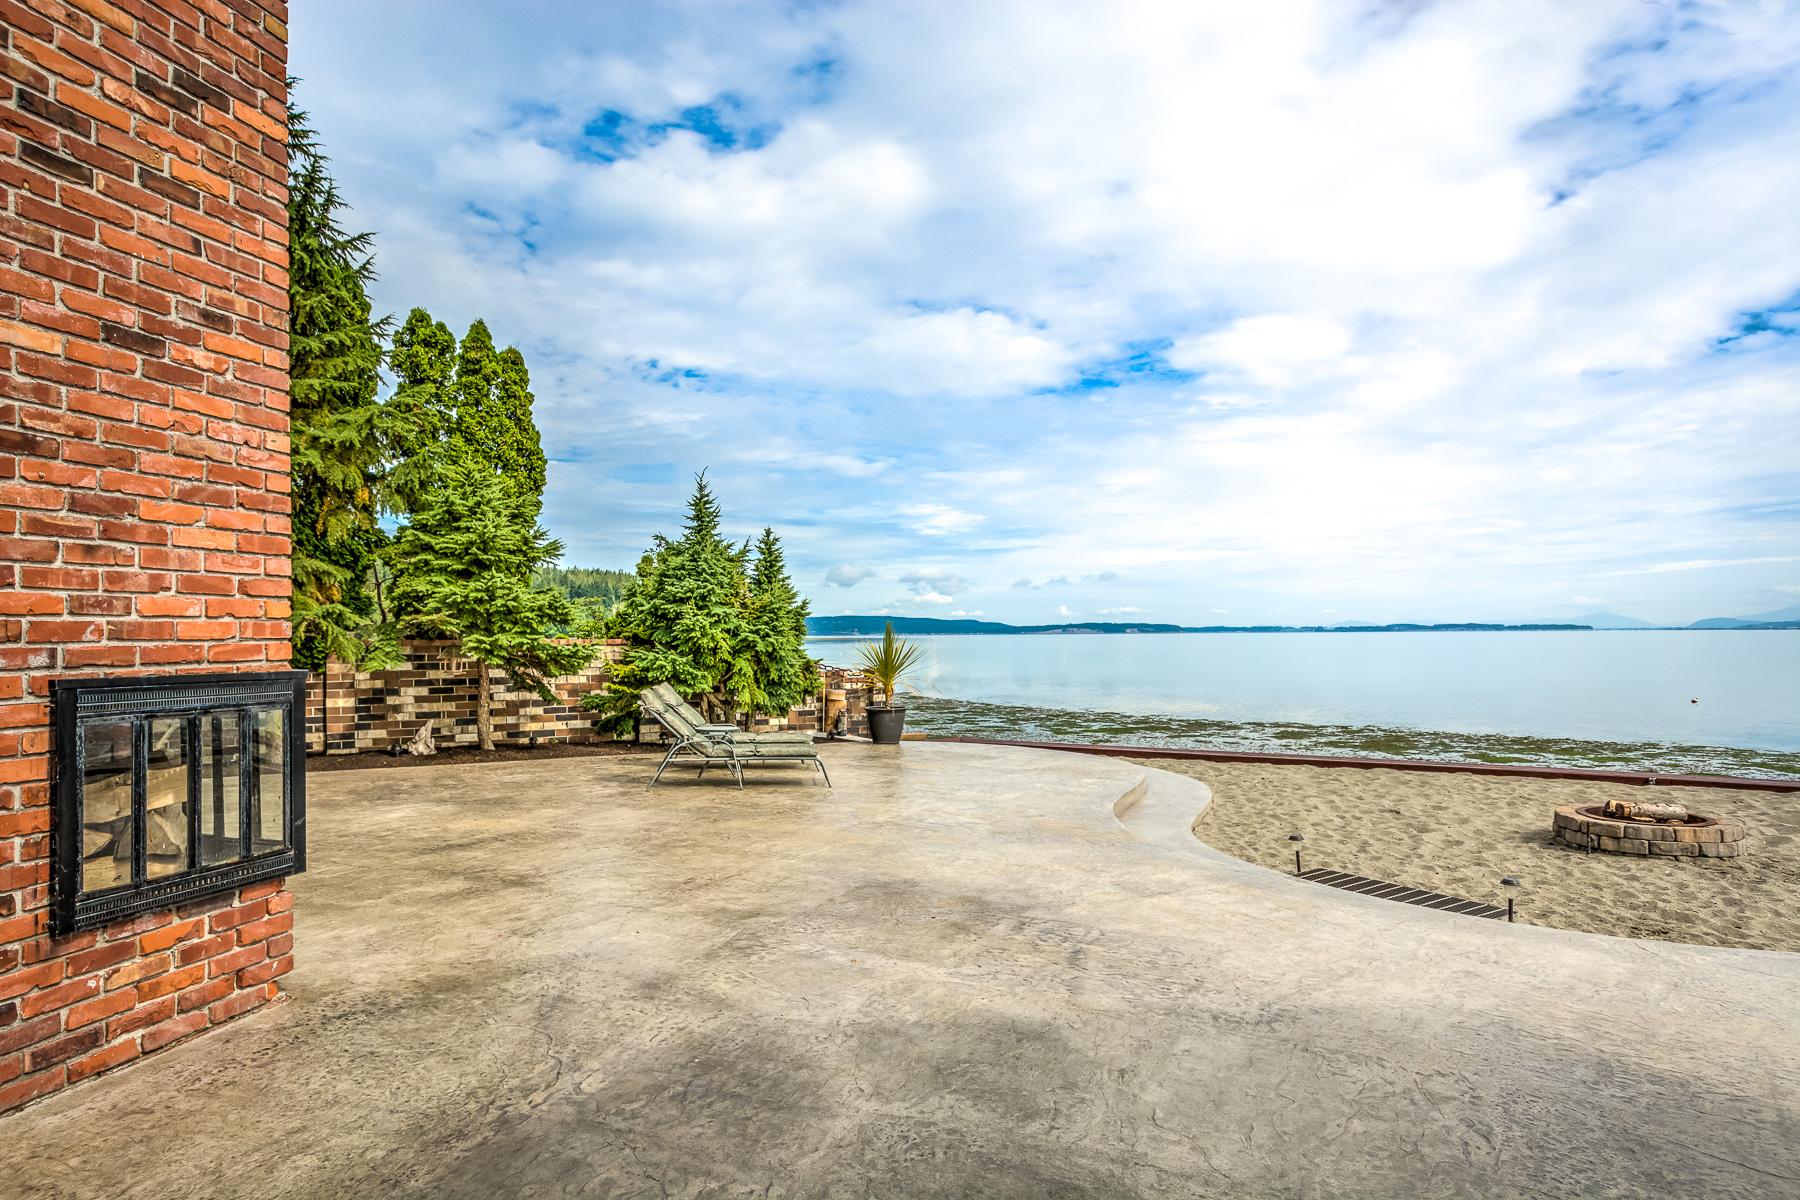 809 Port Susan Terrace Rd HDR Camano Island-3-1800x1200 sRGB.jpg